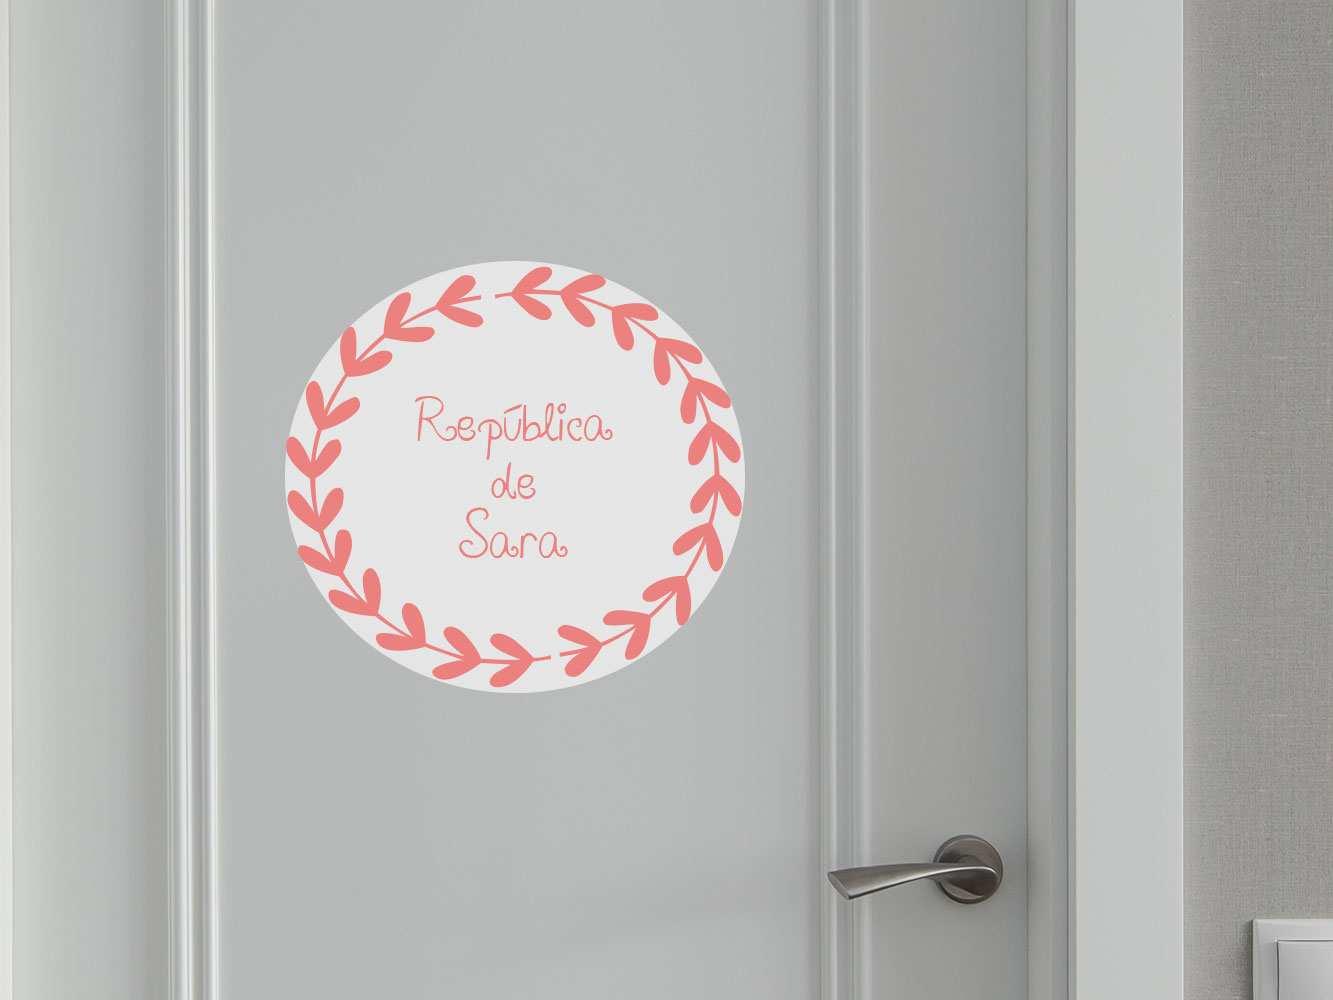 Vinilo Puerta Corona Espigas República Personalizado | Carteles XXL - Impresión carteleria publicitaria